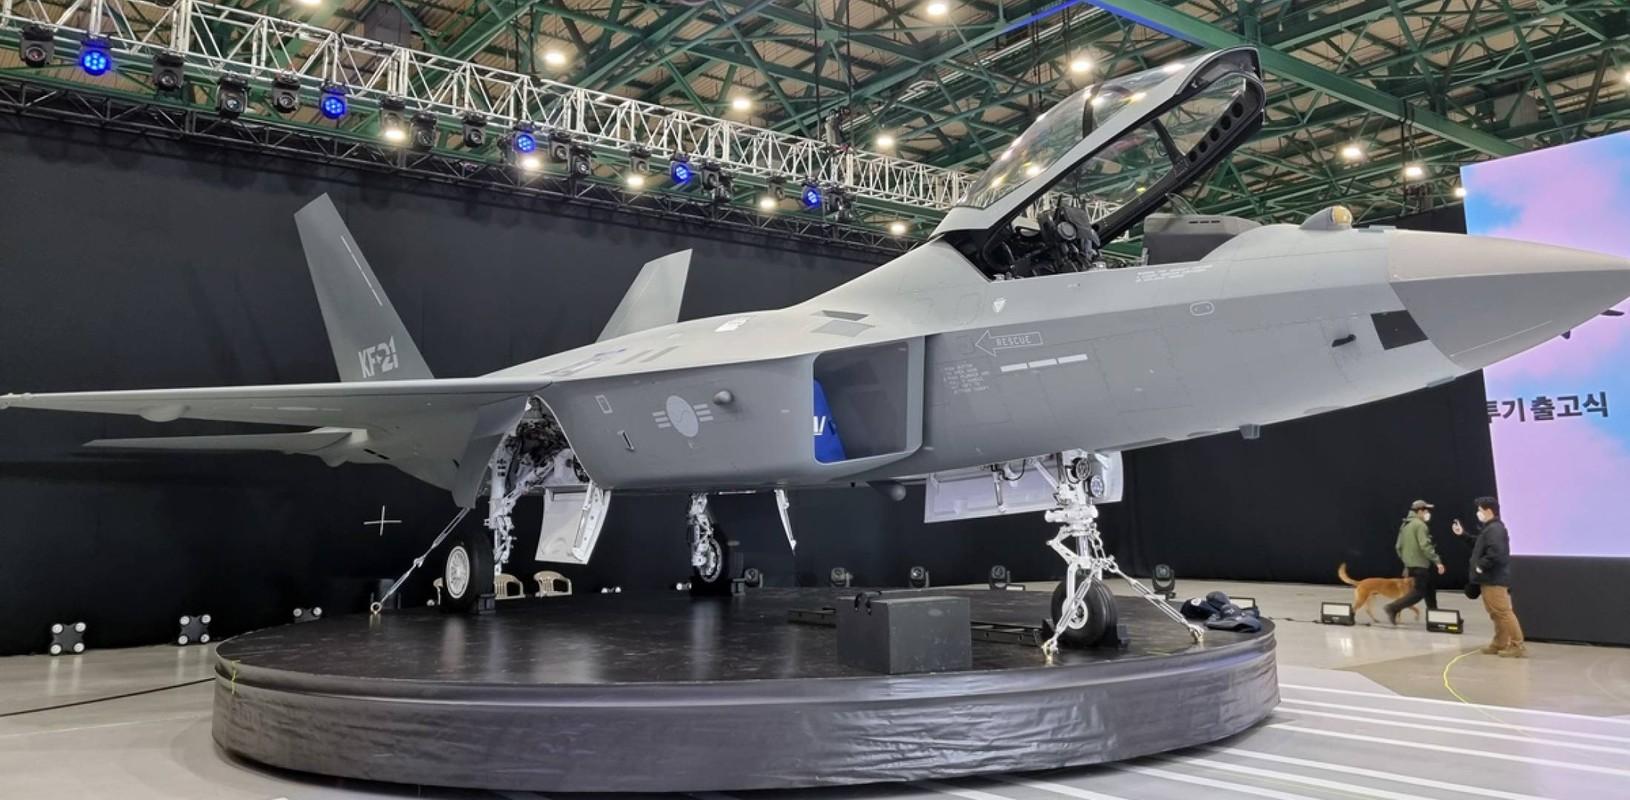 Chien dau co tang hinh KF-21 lieu co du suc sanh ngang F-35?-Hinh-4